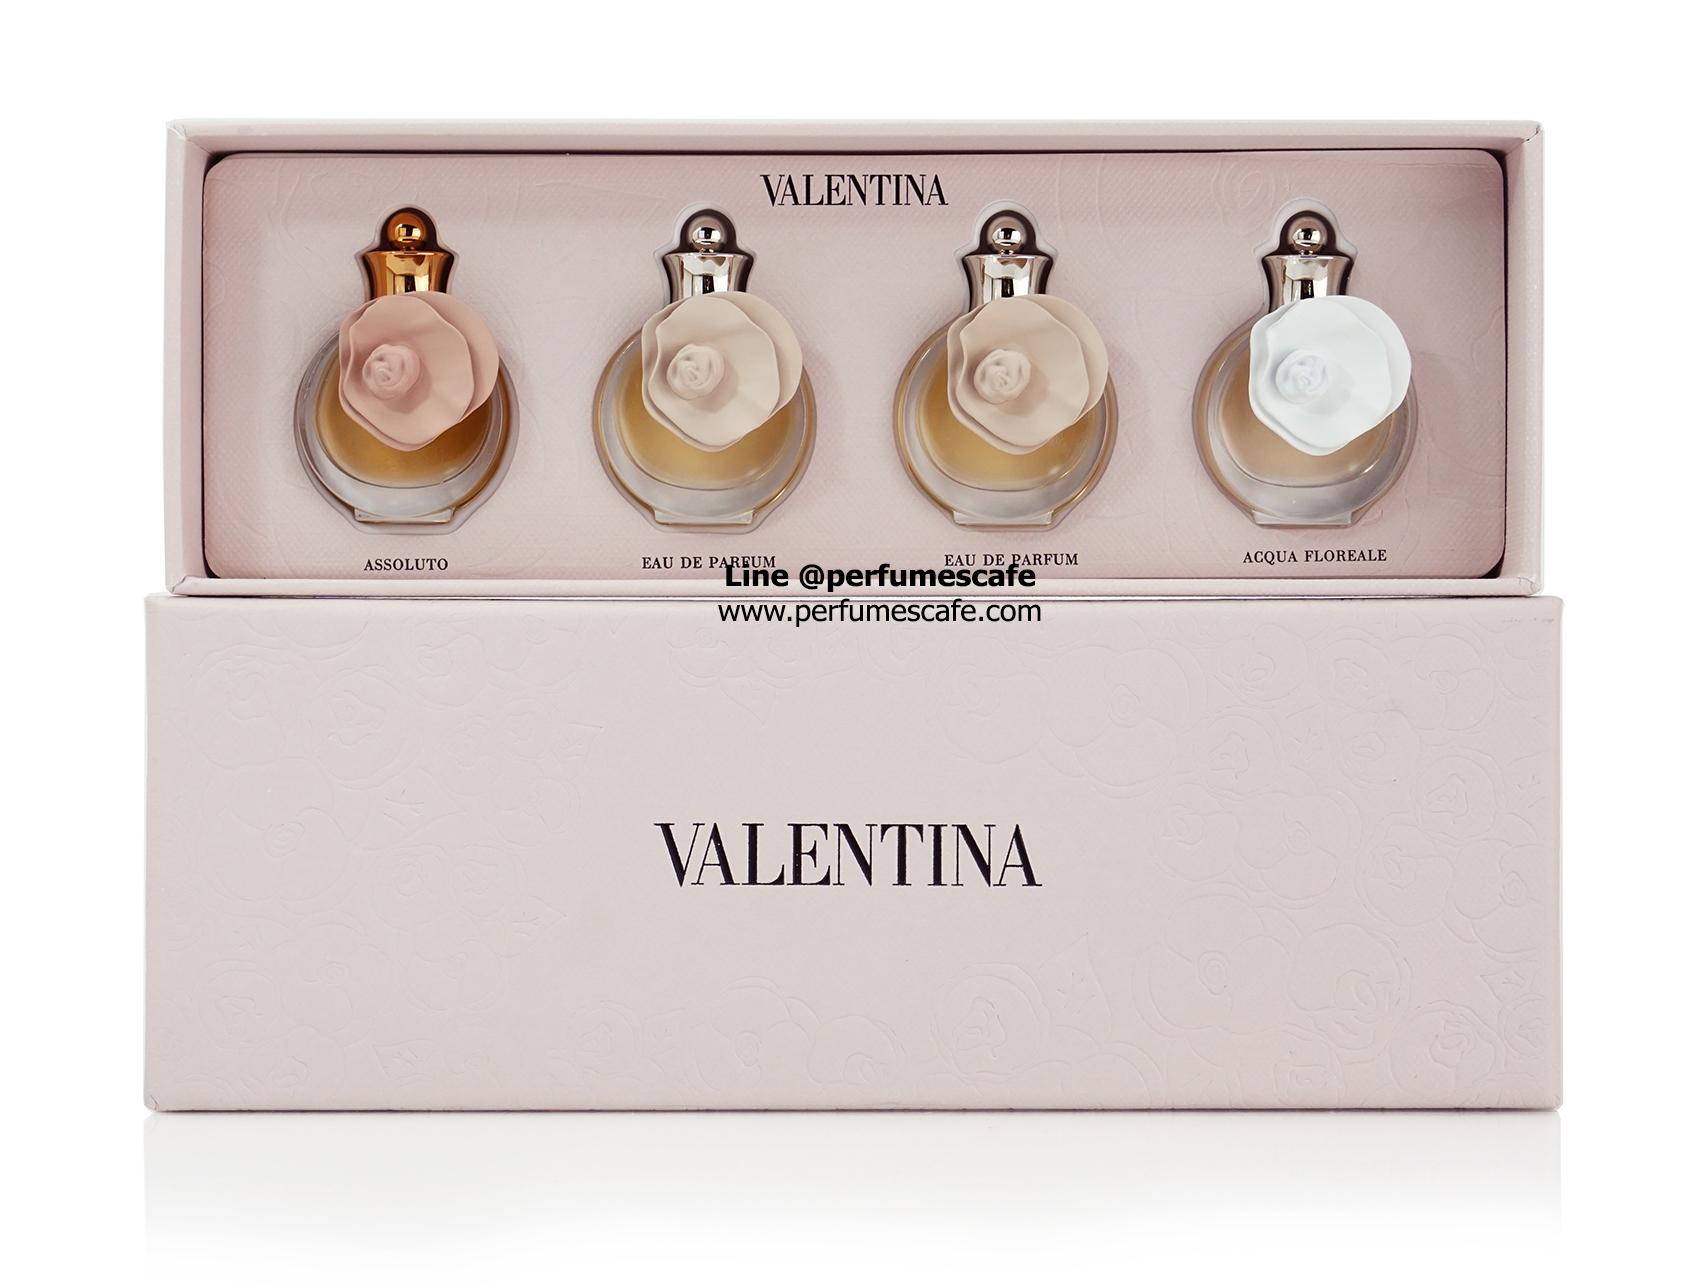 Valentina Valentino Parfum Miniature Gift Set 4ml x 4pcs.